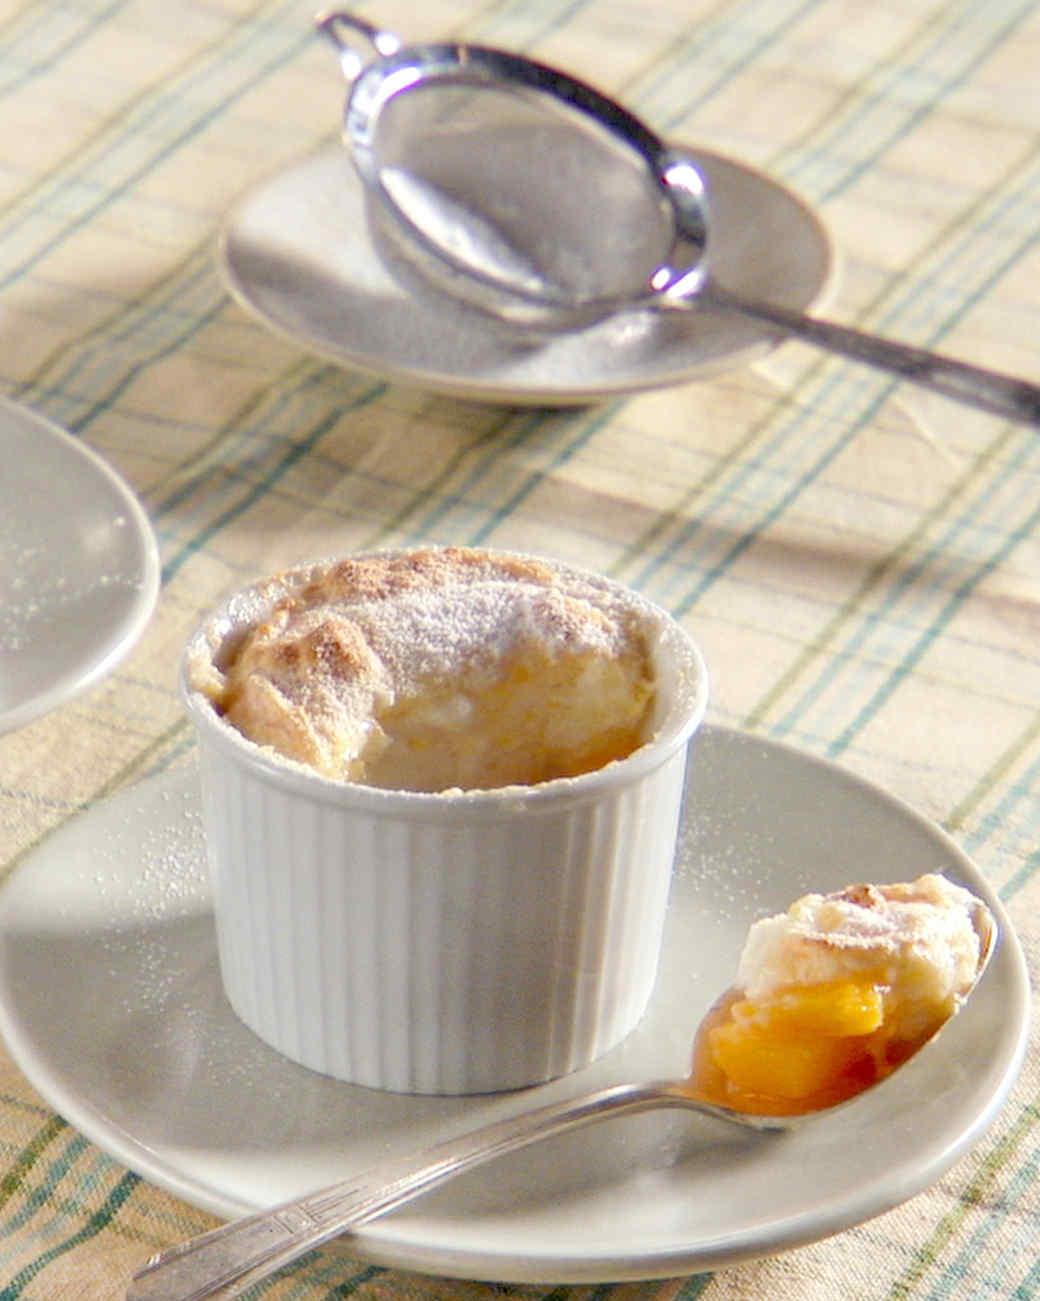 Georgia Peach Souffle